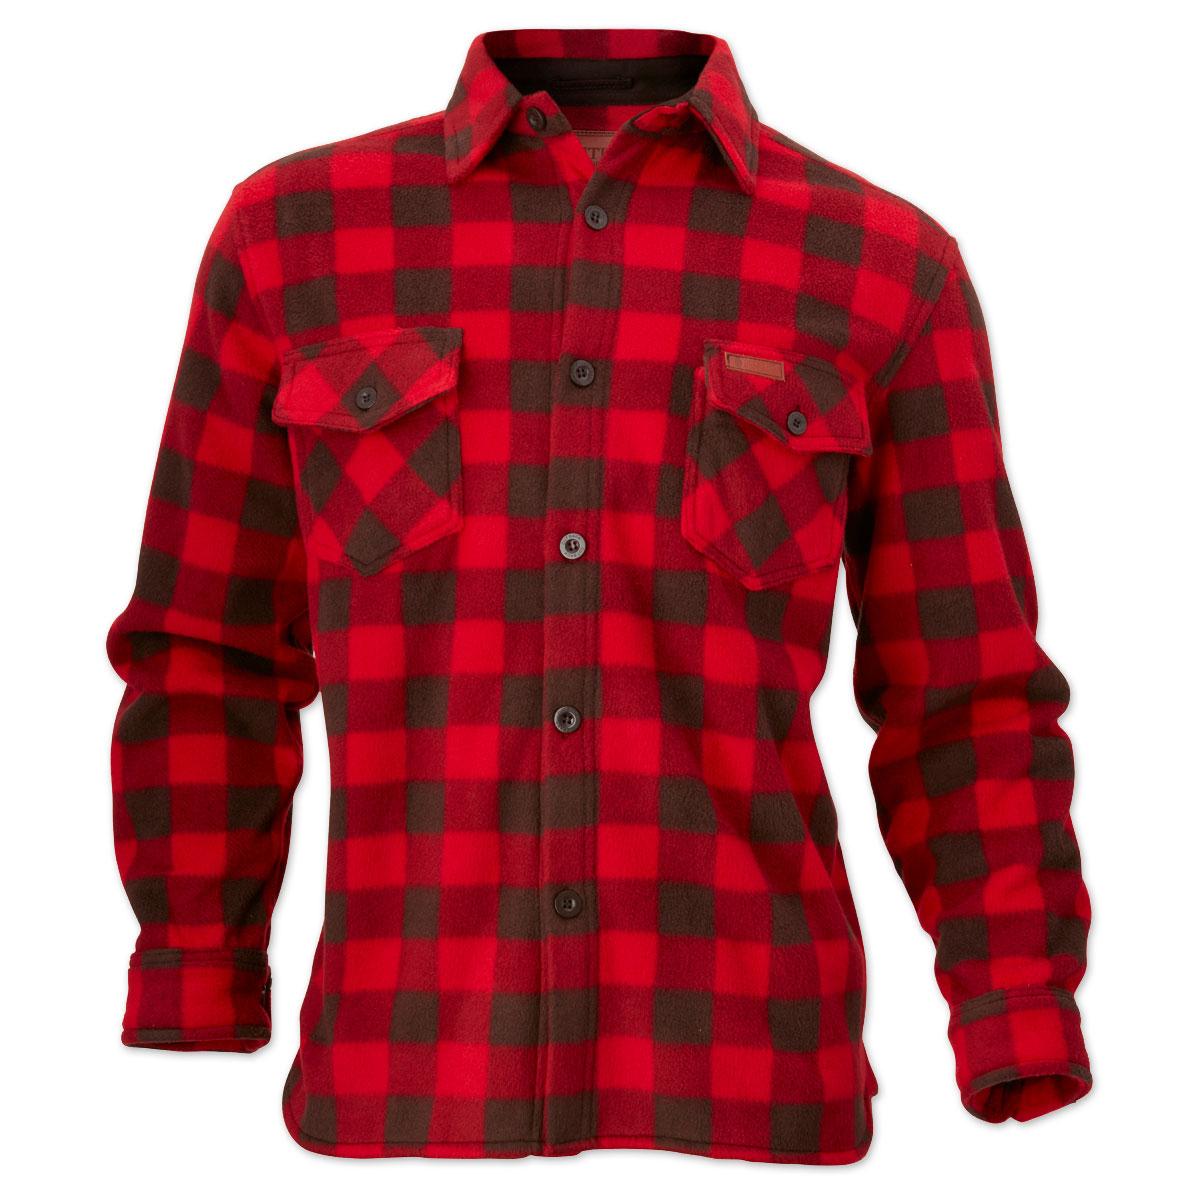 Outback Men's Big Shirt